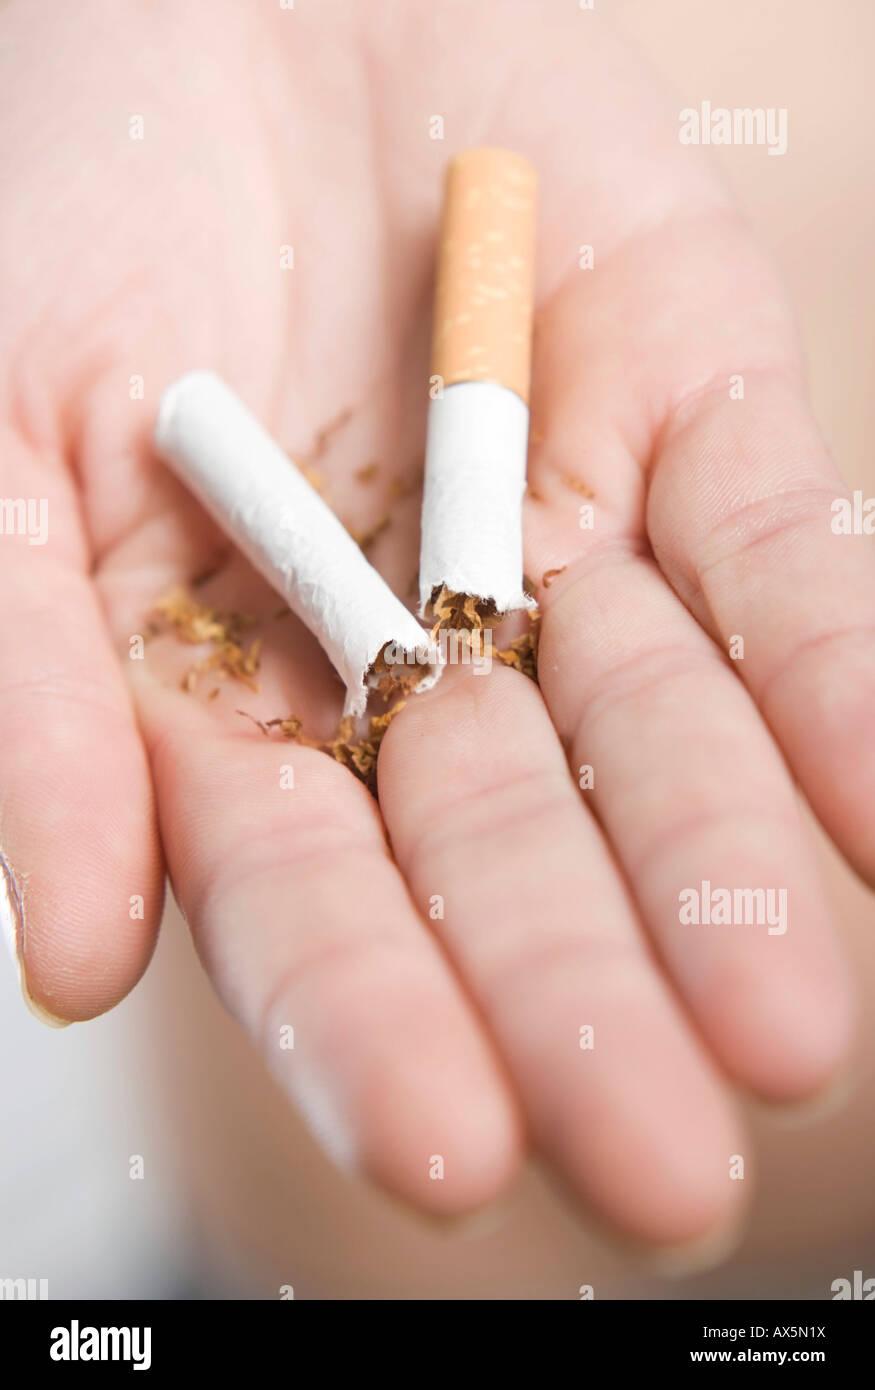 Hand holding a cigarette broken in half Stock Photo